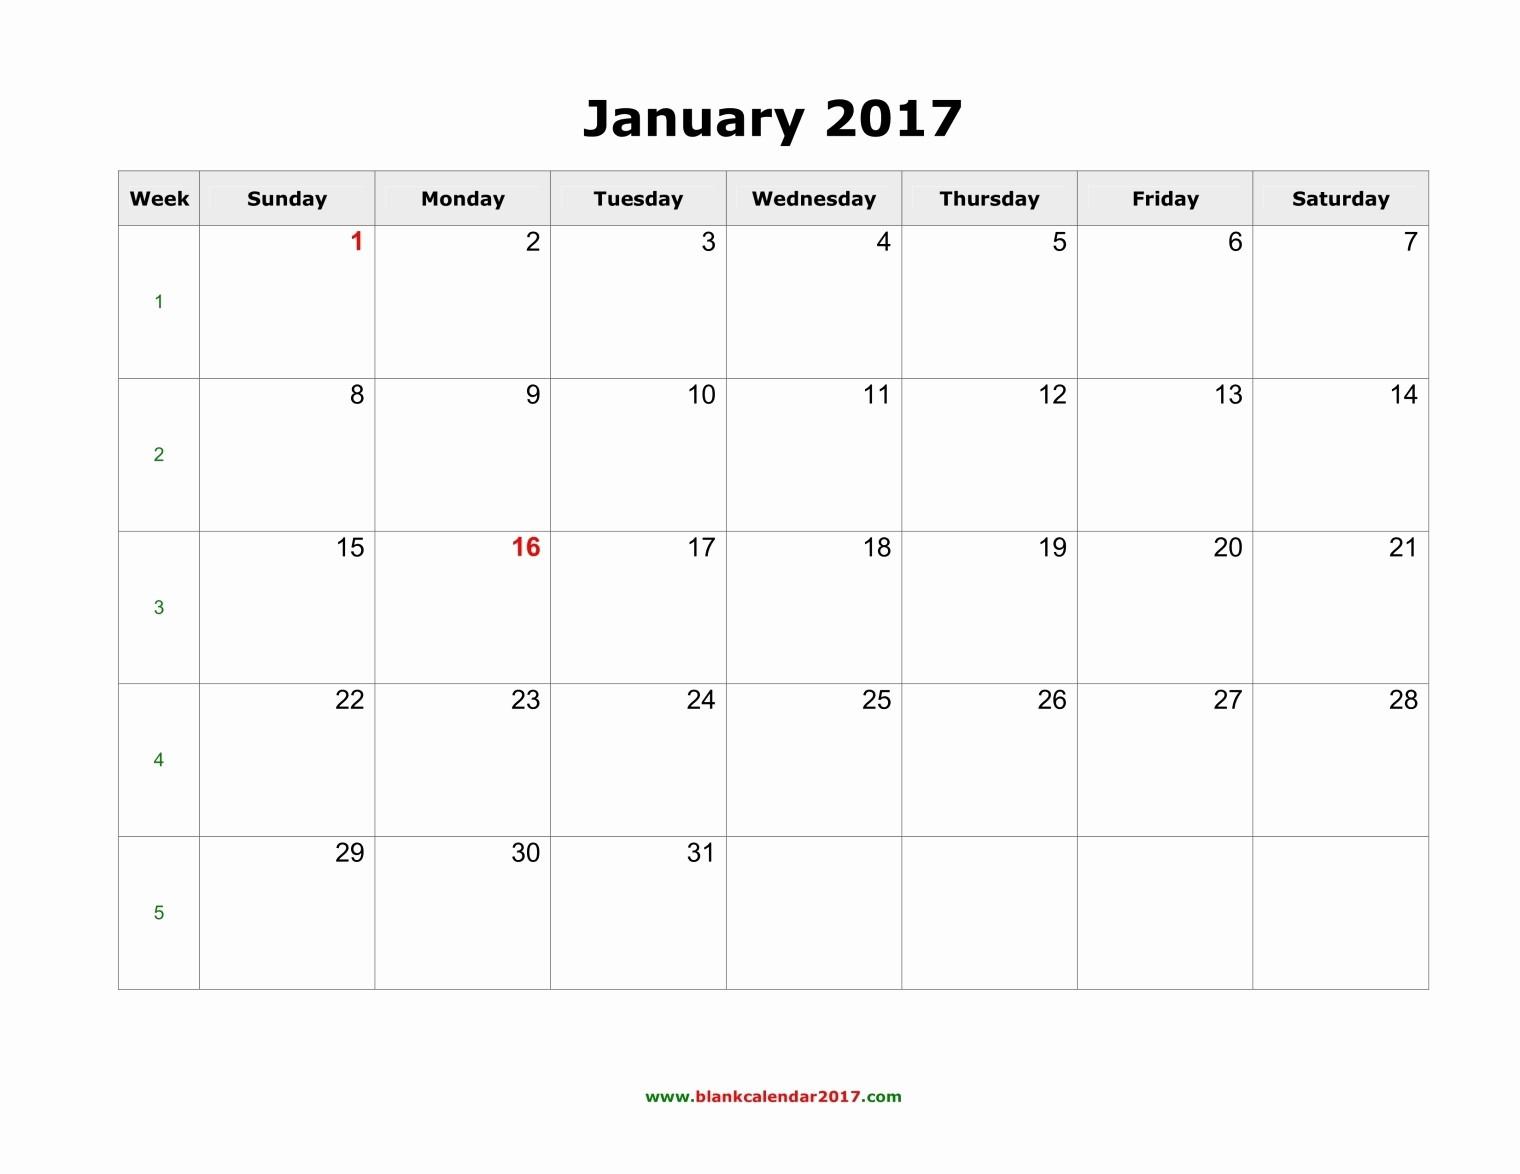 2017 Quarterly Calendar Template Excel New Blank Monthly Calendar 2017